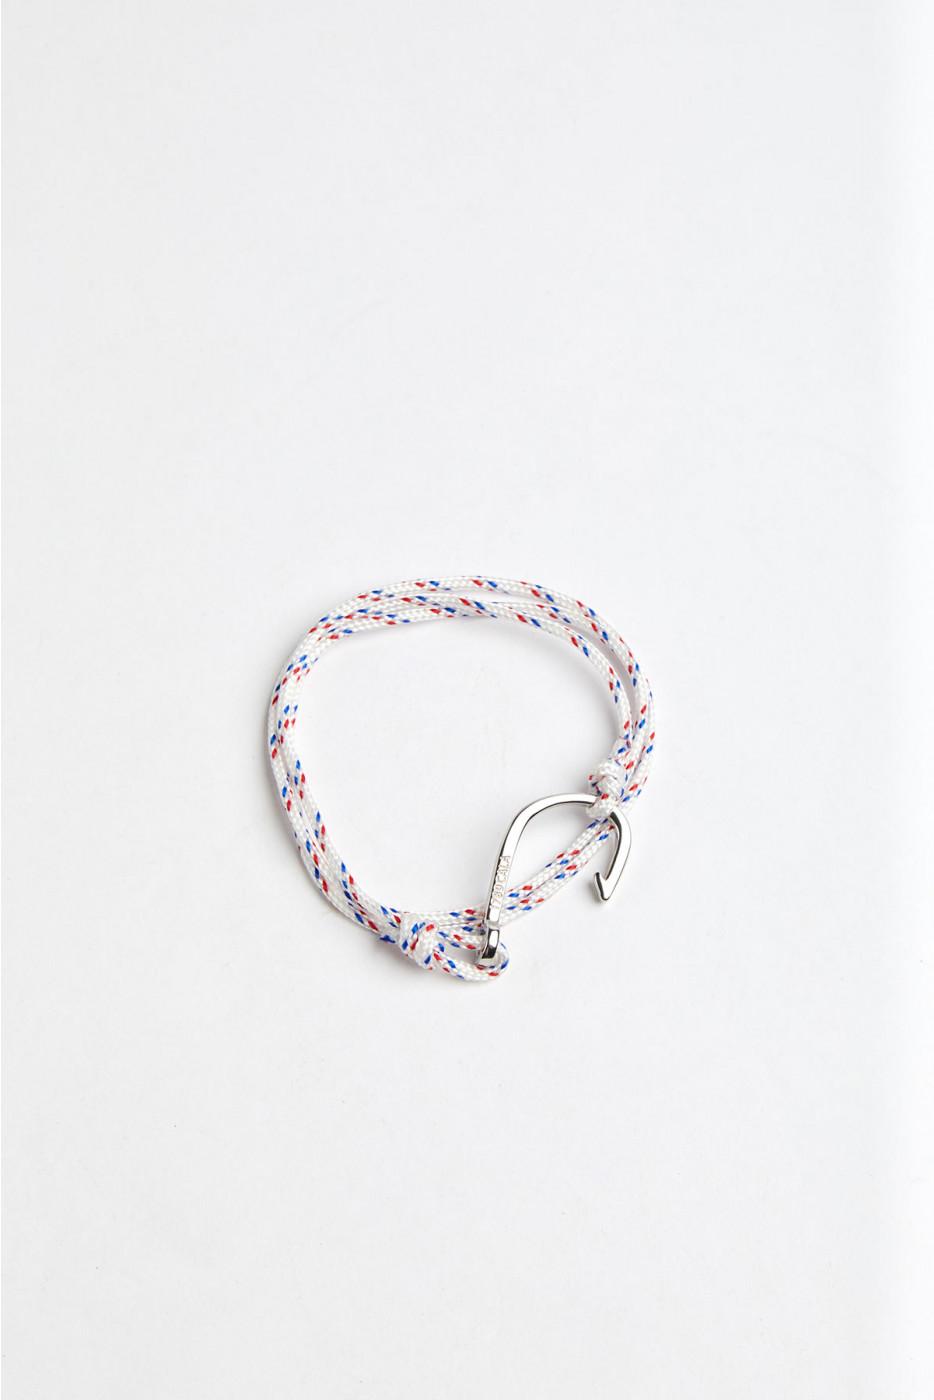 Bracelet Corde Blanc -  HAMEÇON BRACELET